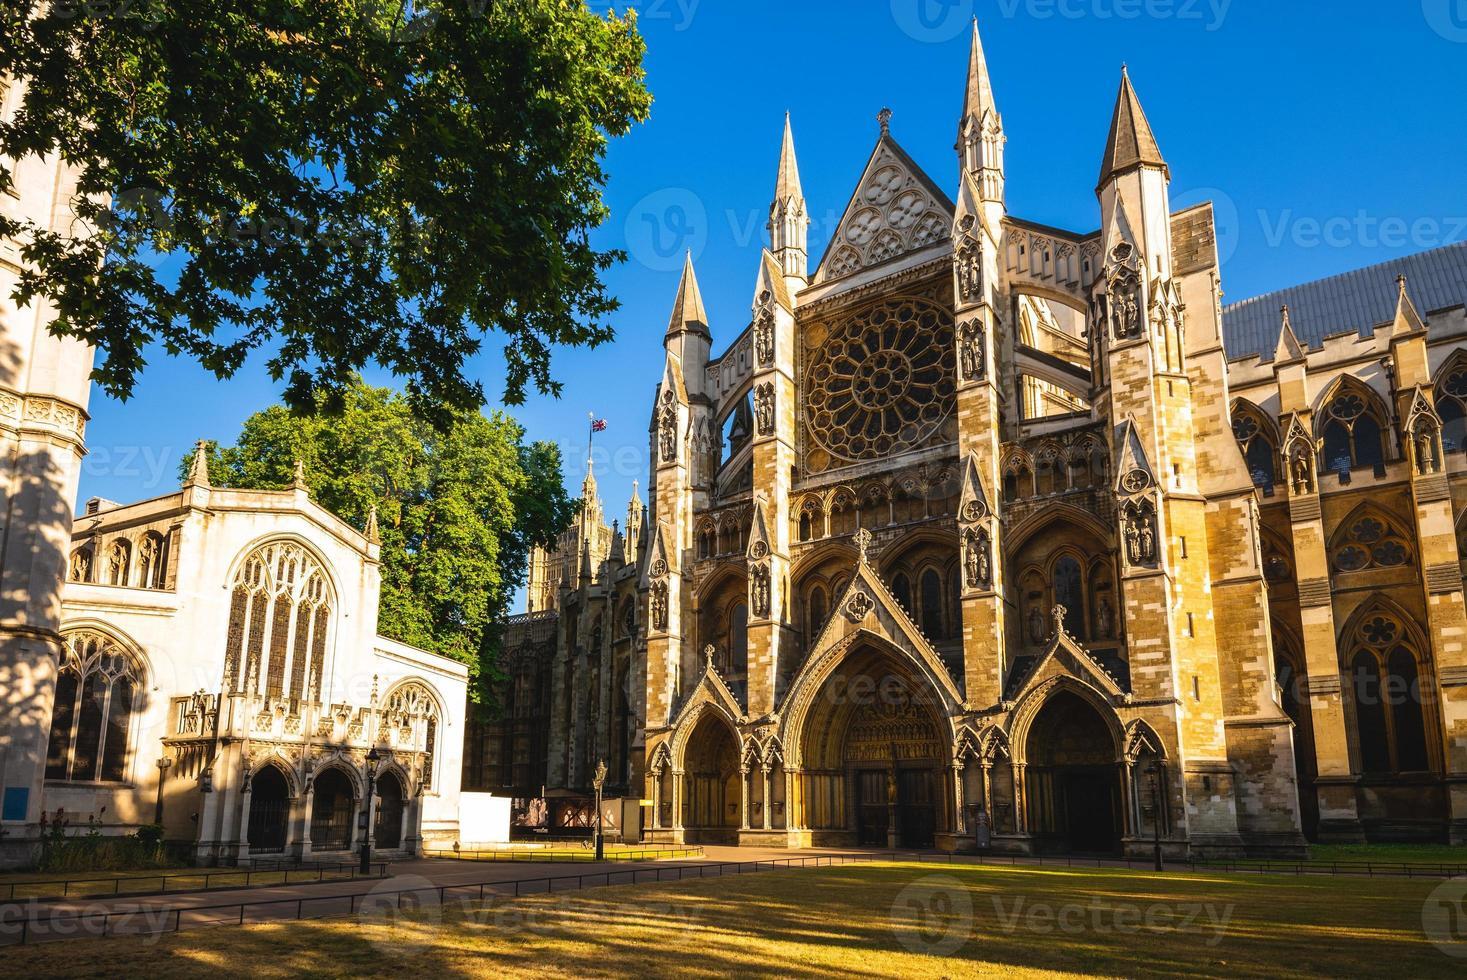 Façade de l'abbaye de Westminster à Londres, Angleterre, Royaume-Uni photo